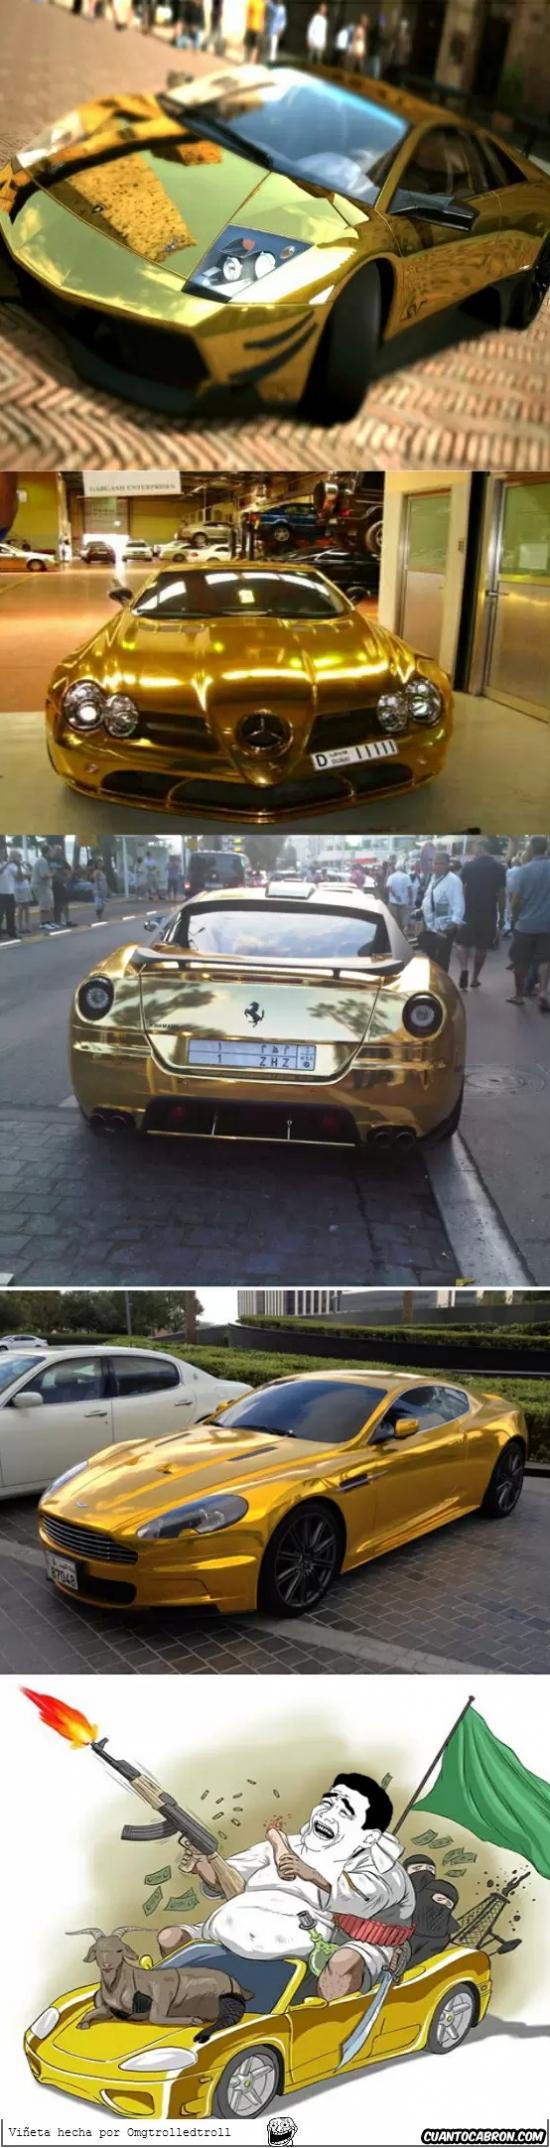 asquerosamente rico,coches de oro,dubai,jeque,petrodolares,Yao ming